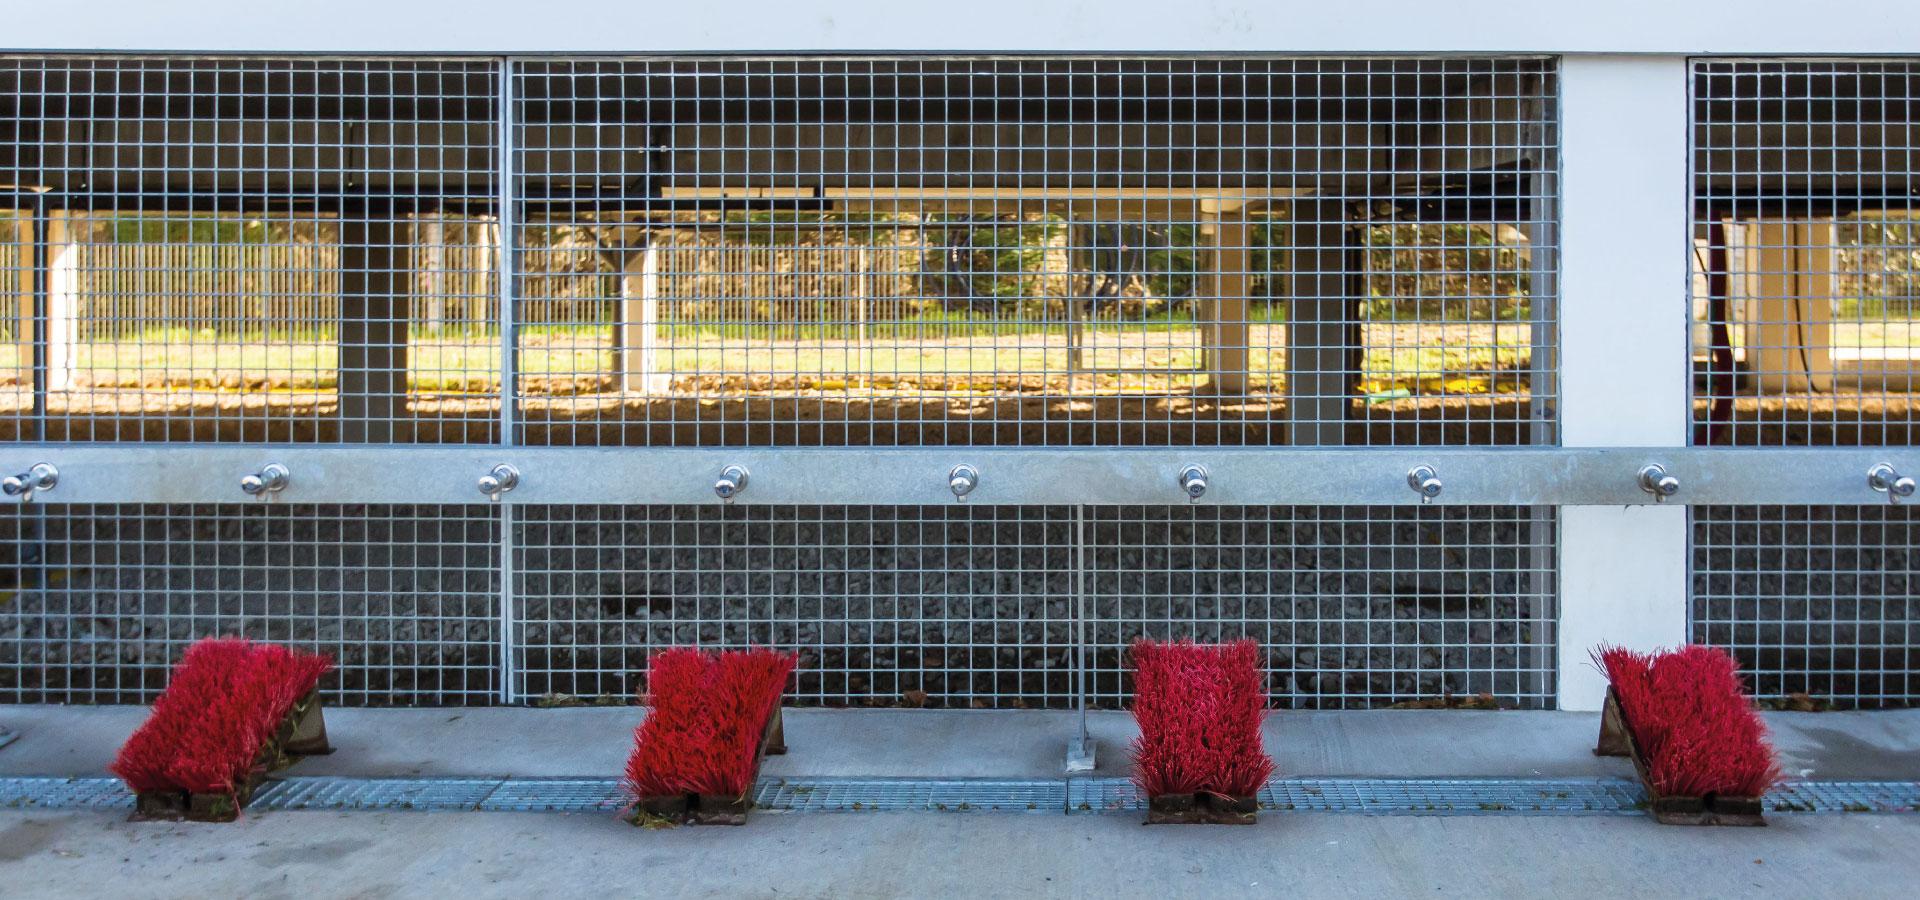 zubieta-constructions-renovation-fondation-maconnerie-saint-jean-de-luz-urrugne-ciboure